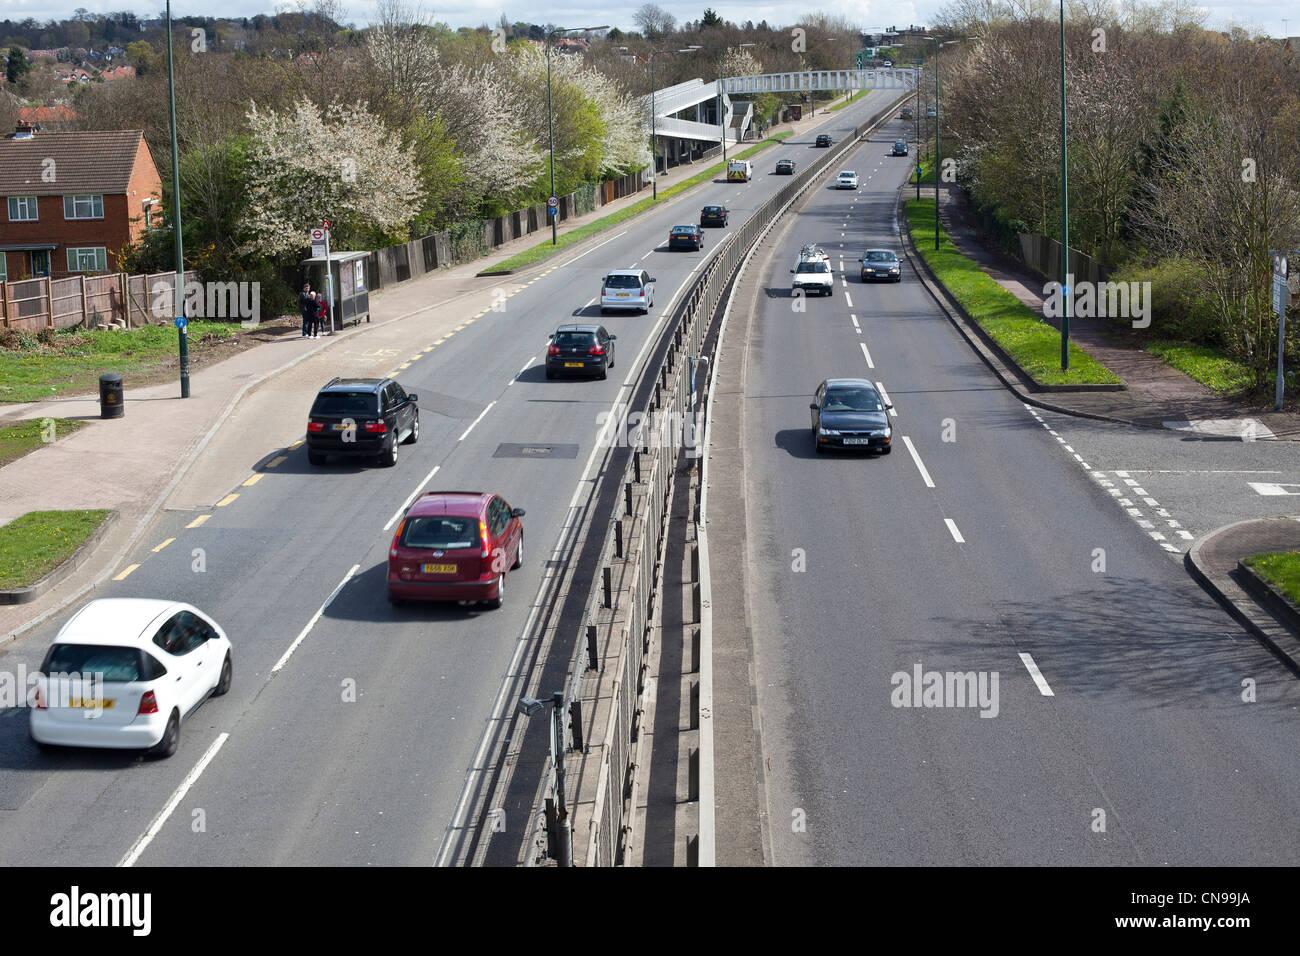 Dual carriageway, Edgware Way, Watford By-Pass, Barnet, England, UK - Stock Image